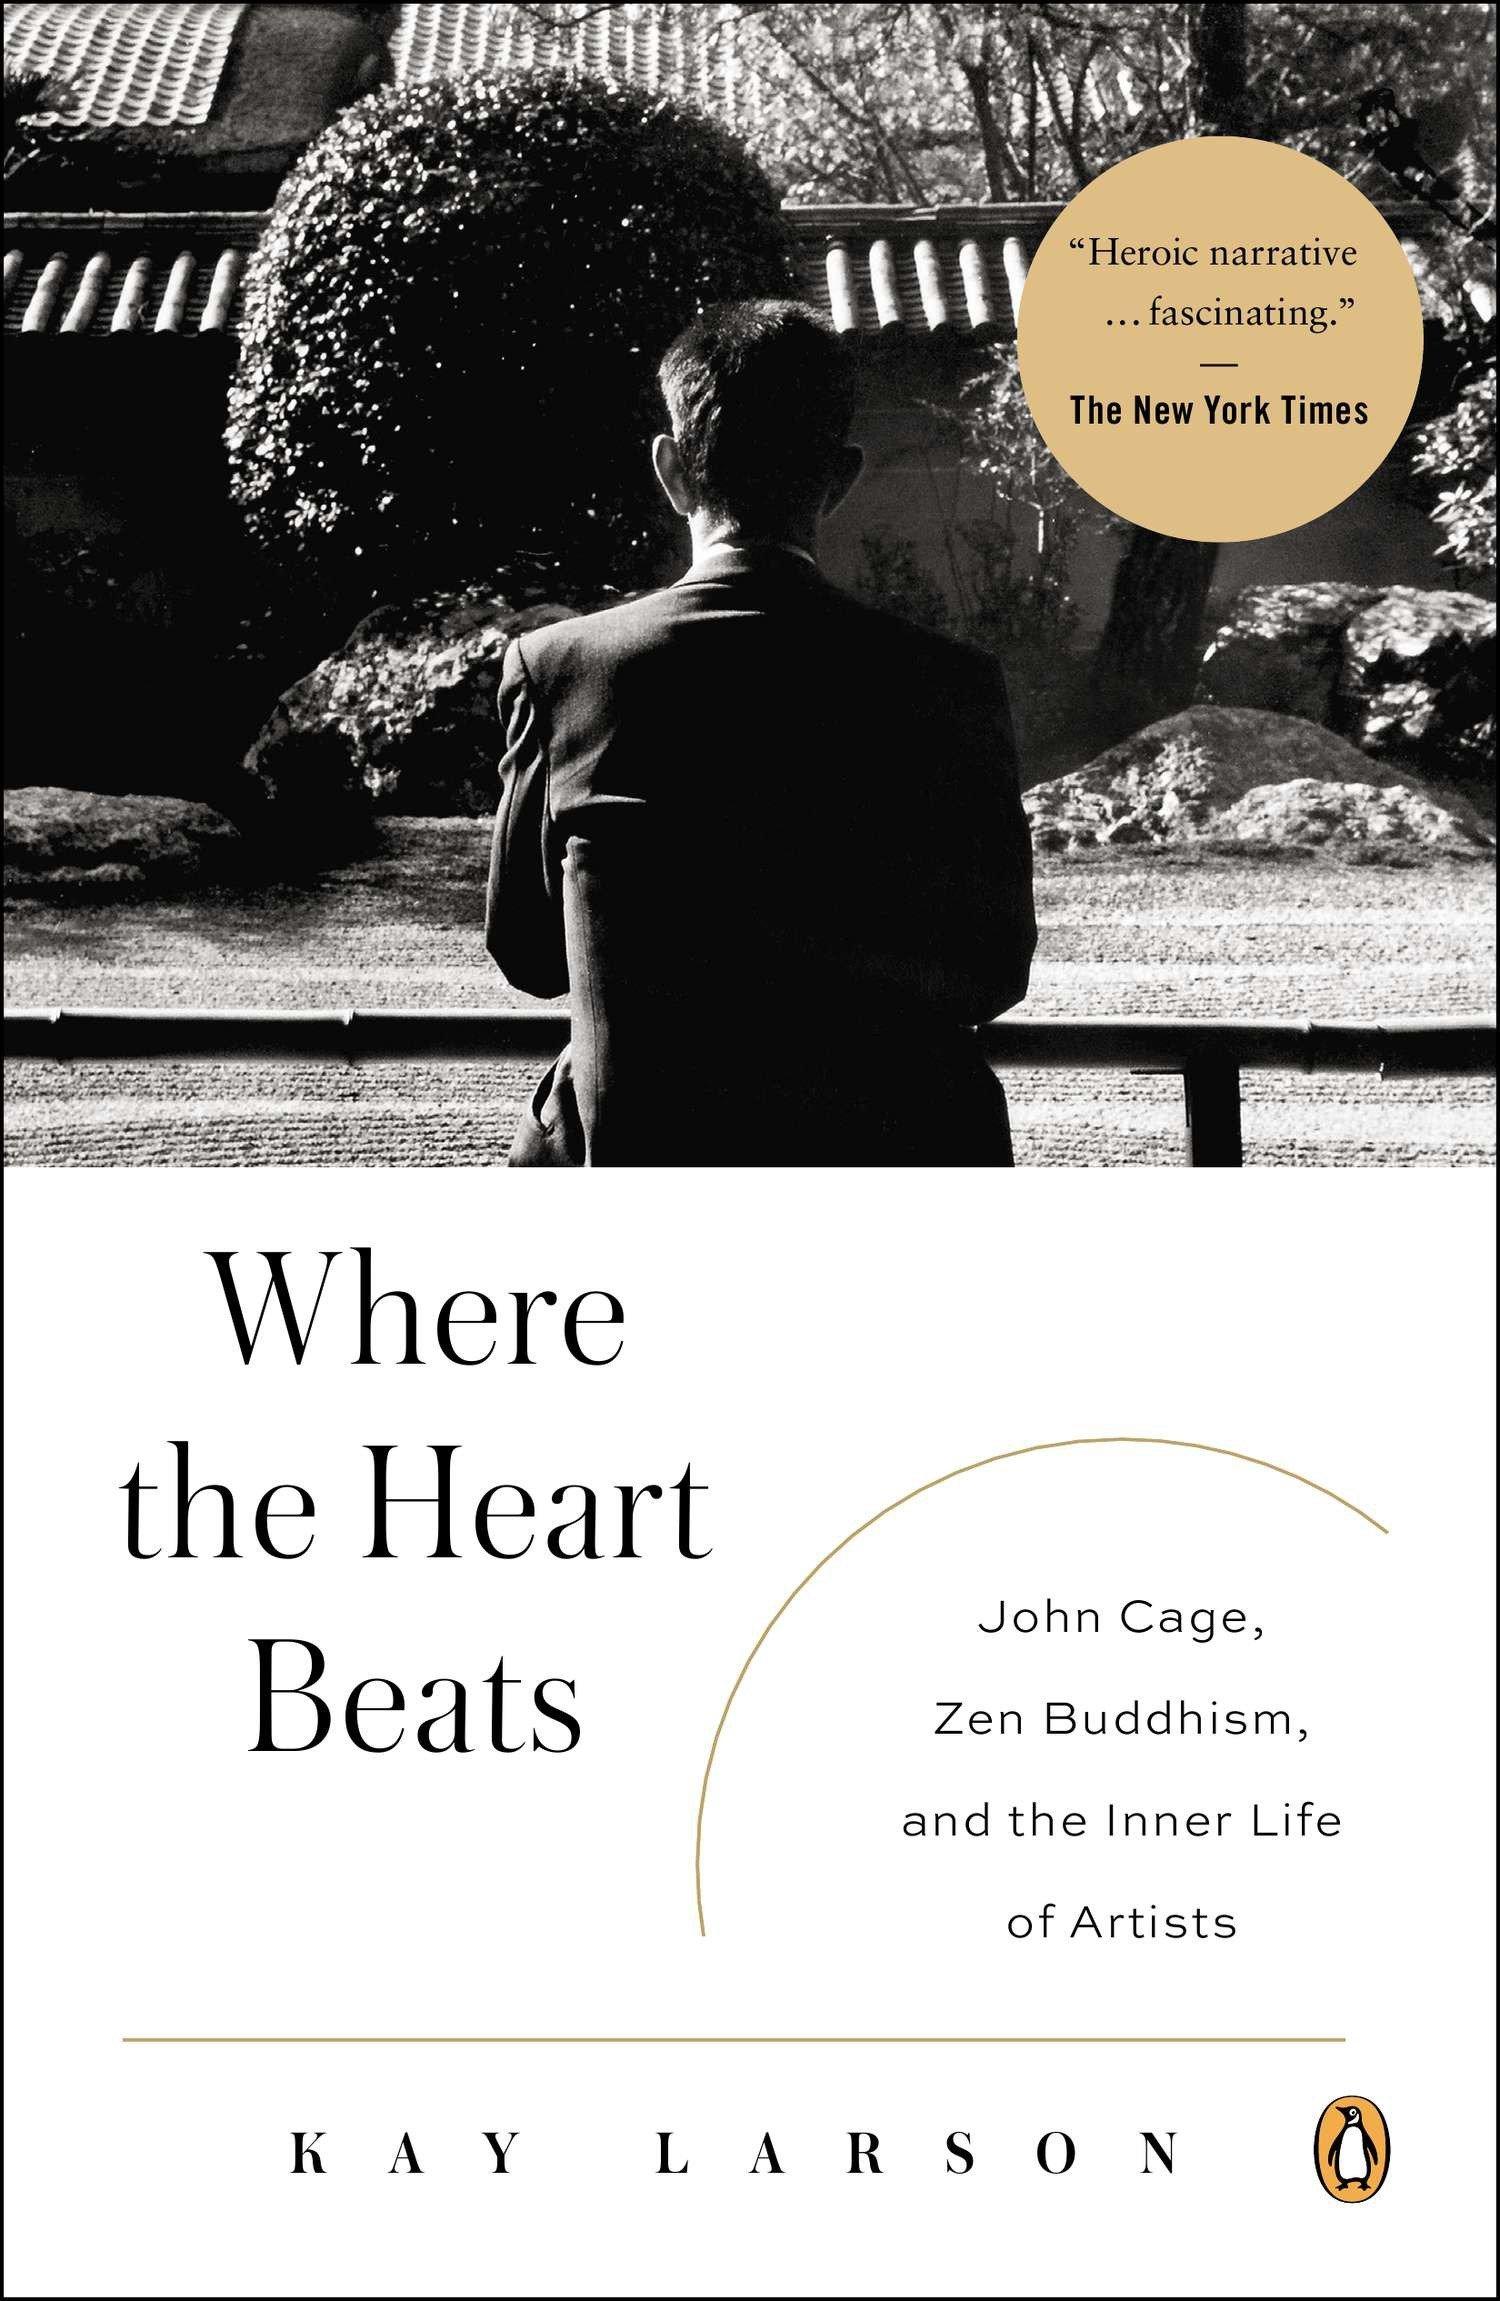 Larson Heart Beats cover art